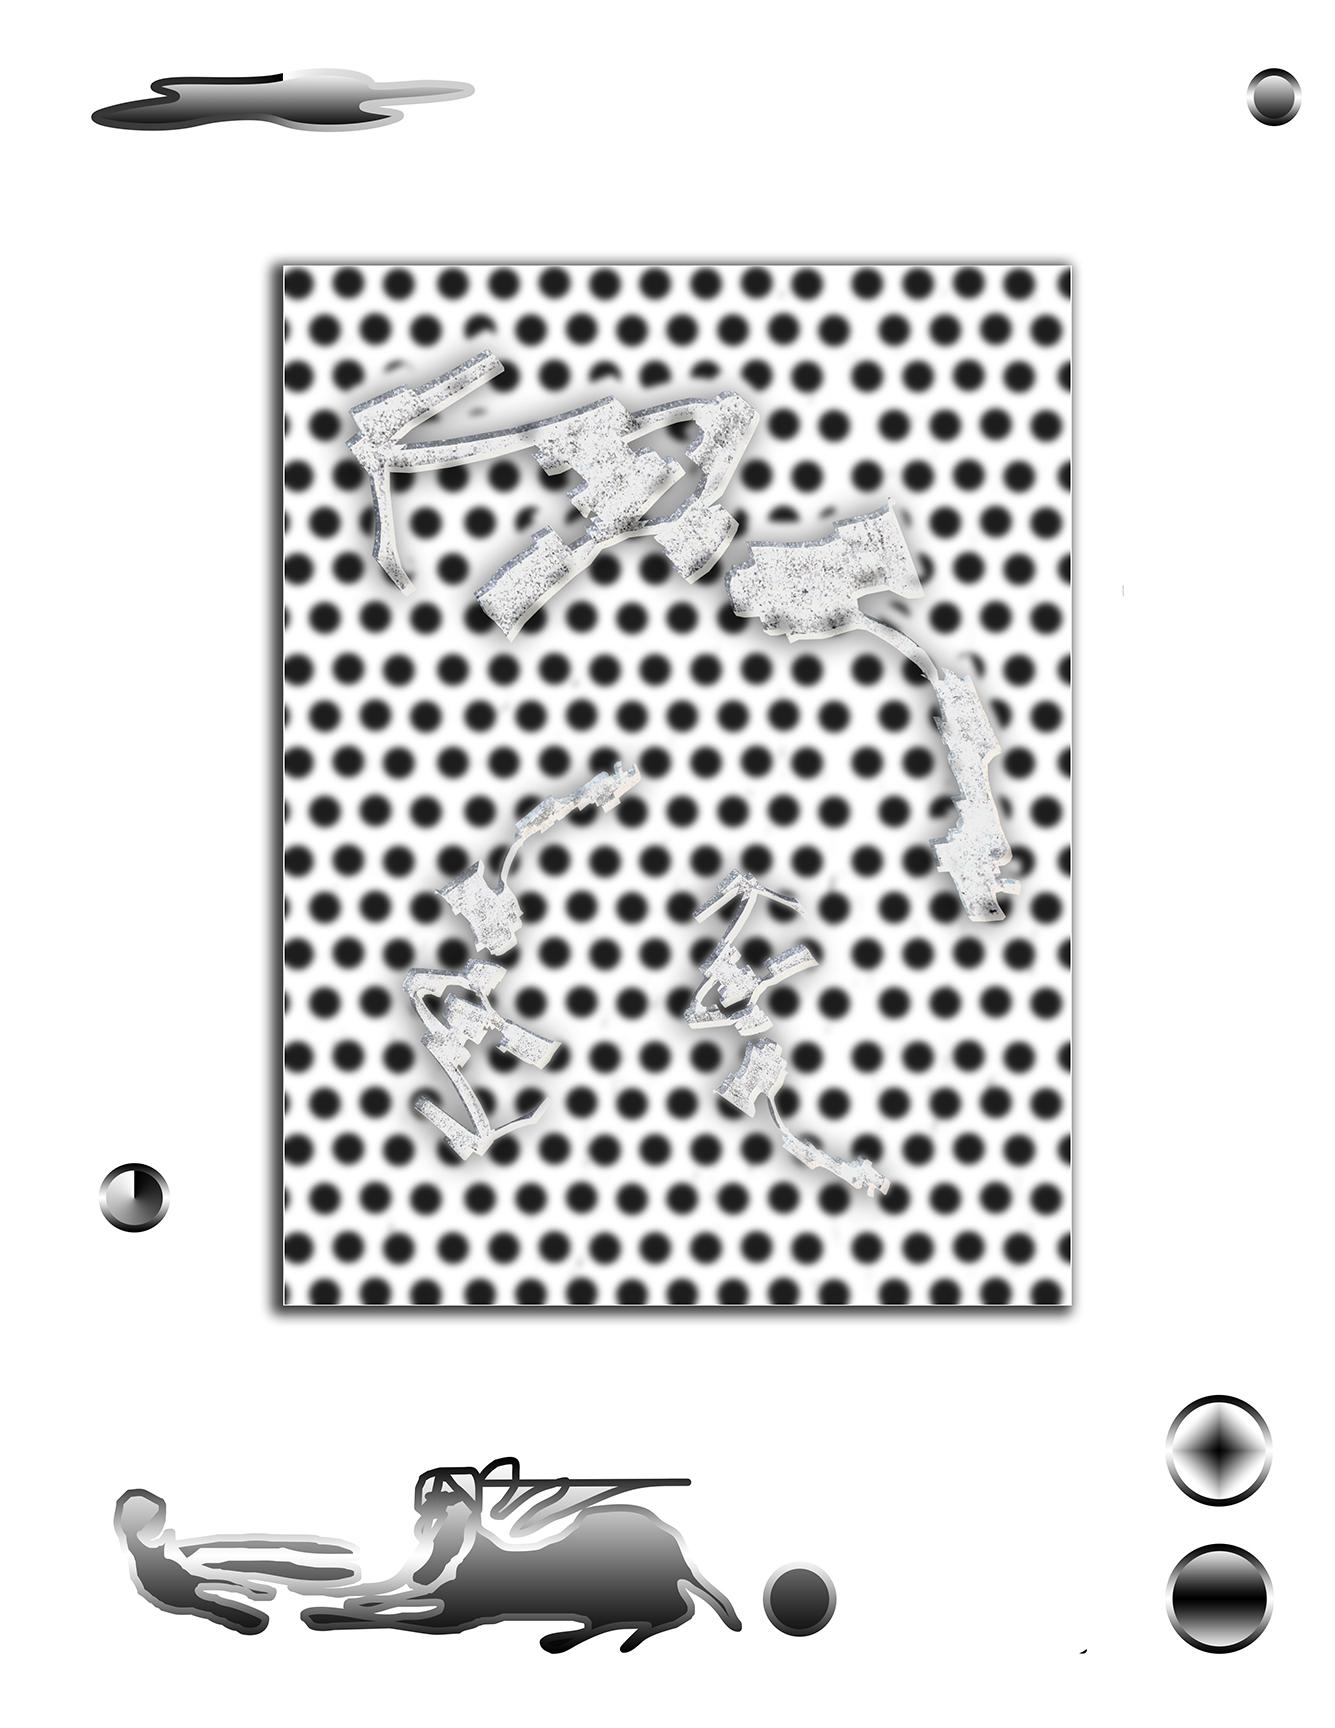 9. (UNTITLED) - DIGITAL COLLAGE